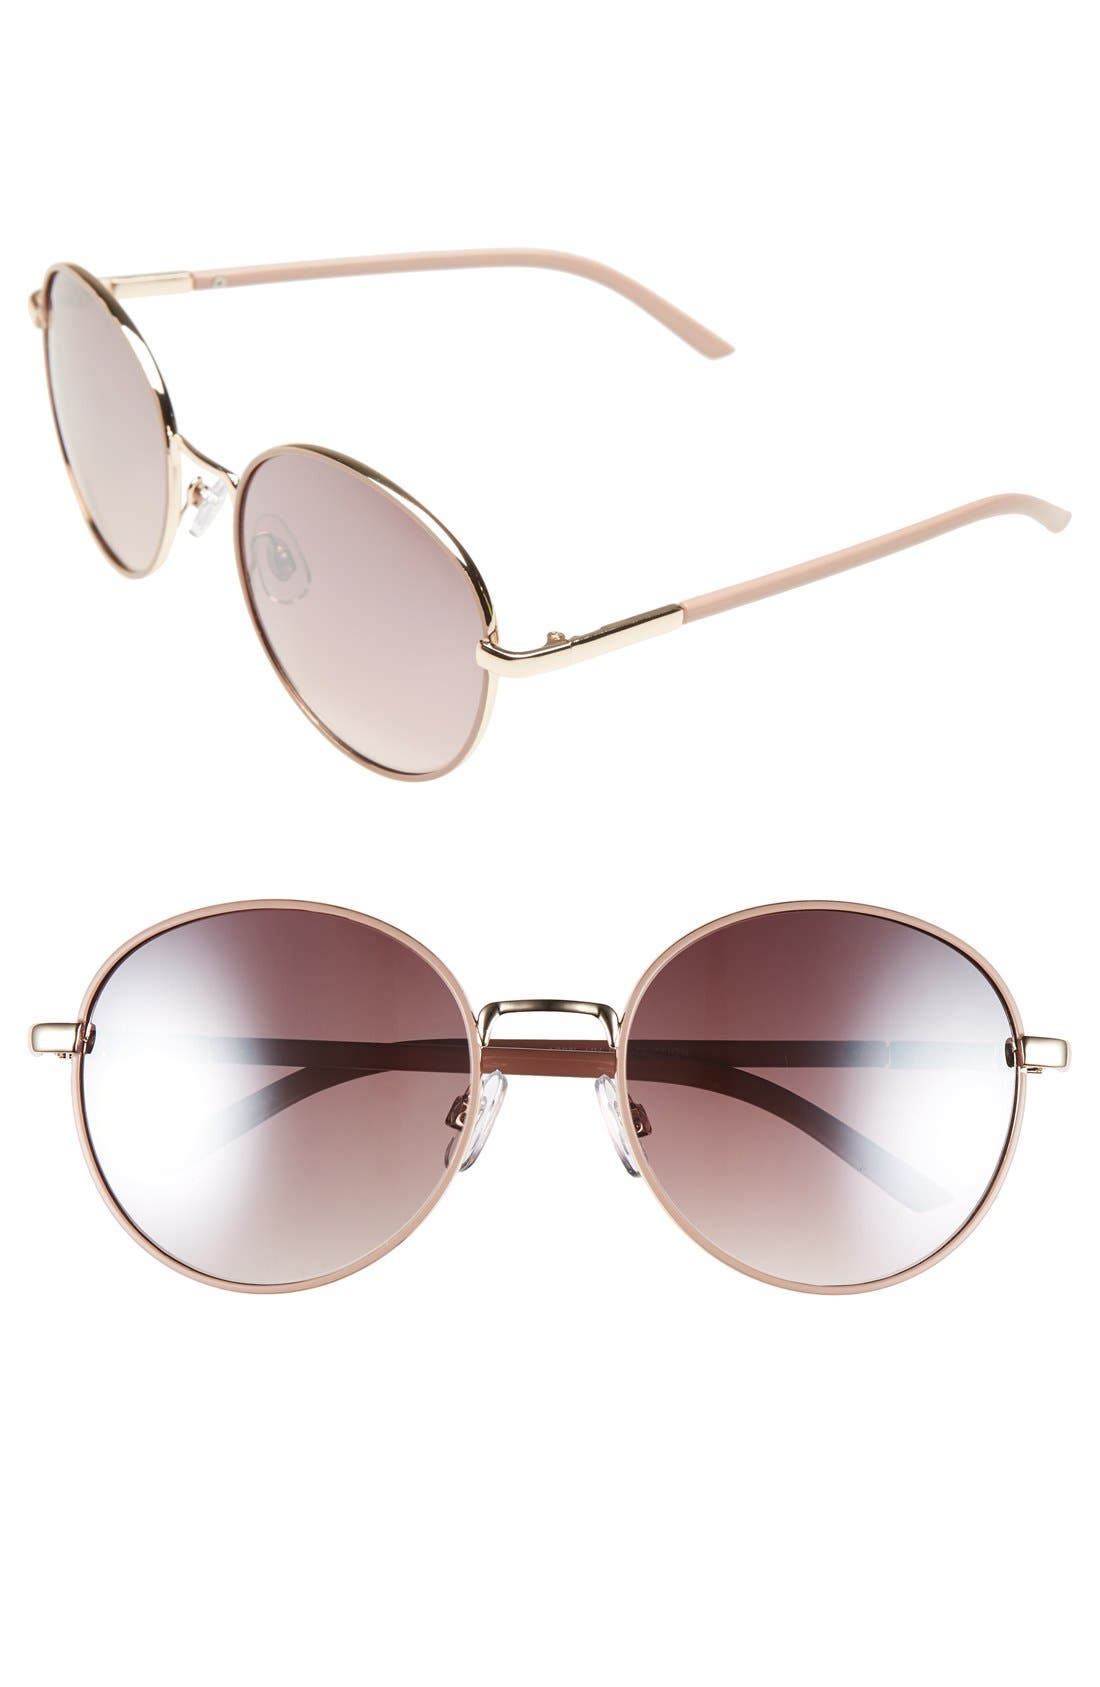 55mm Round Sunglasses,                         Main,                         color, Mauve